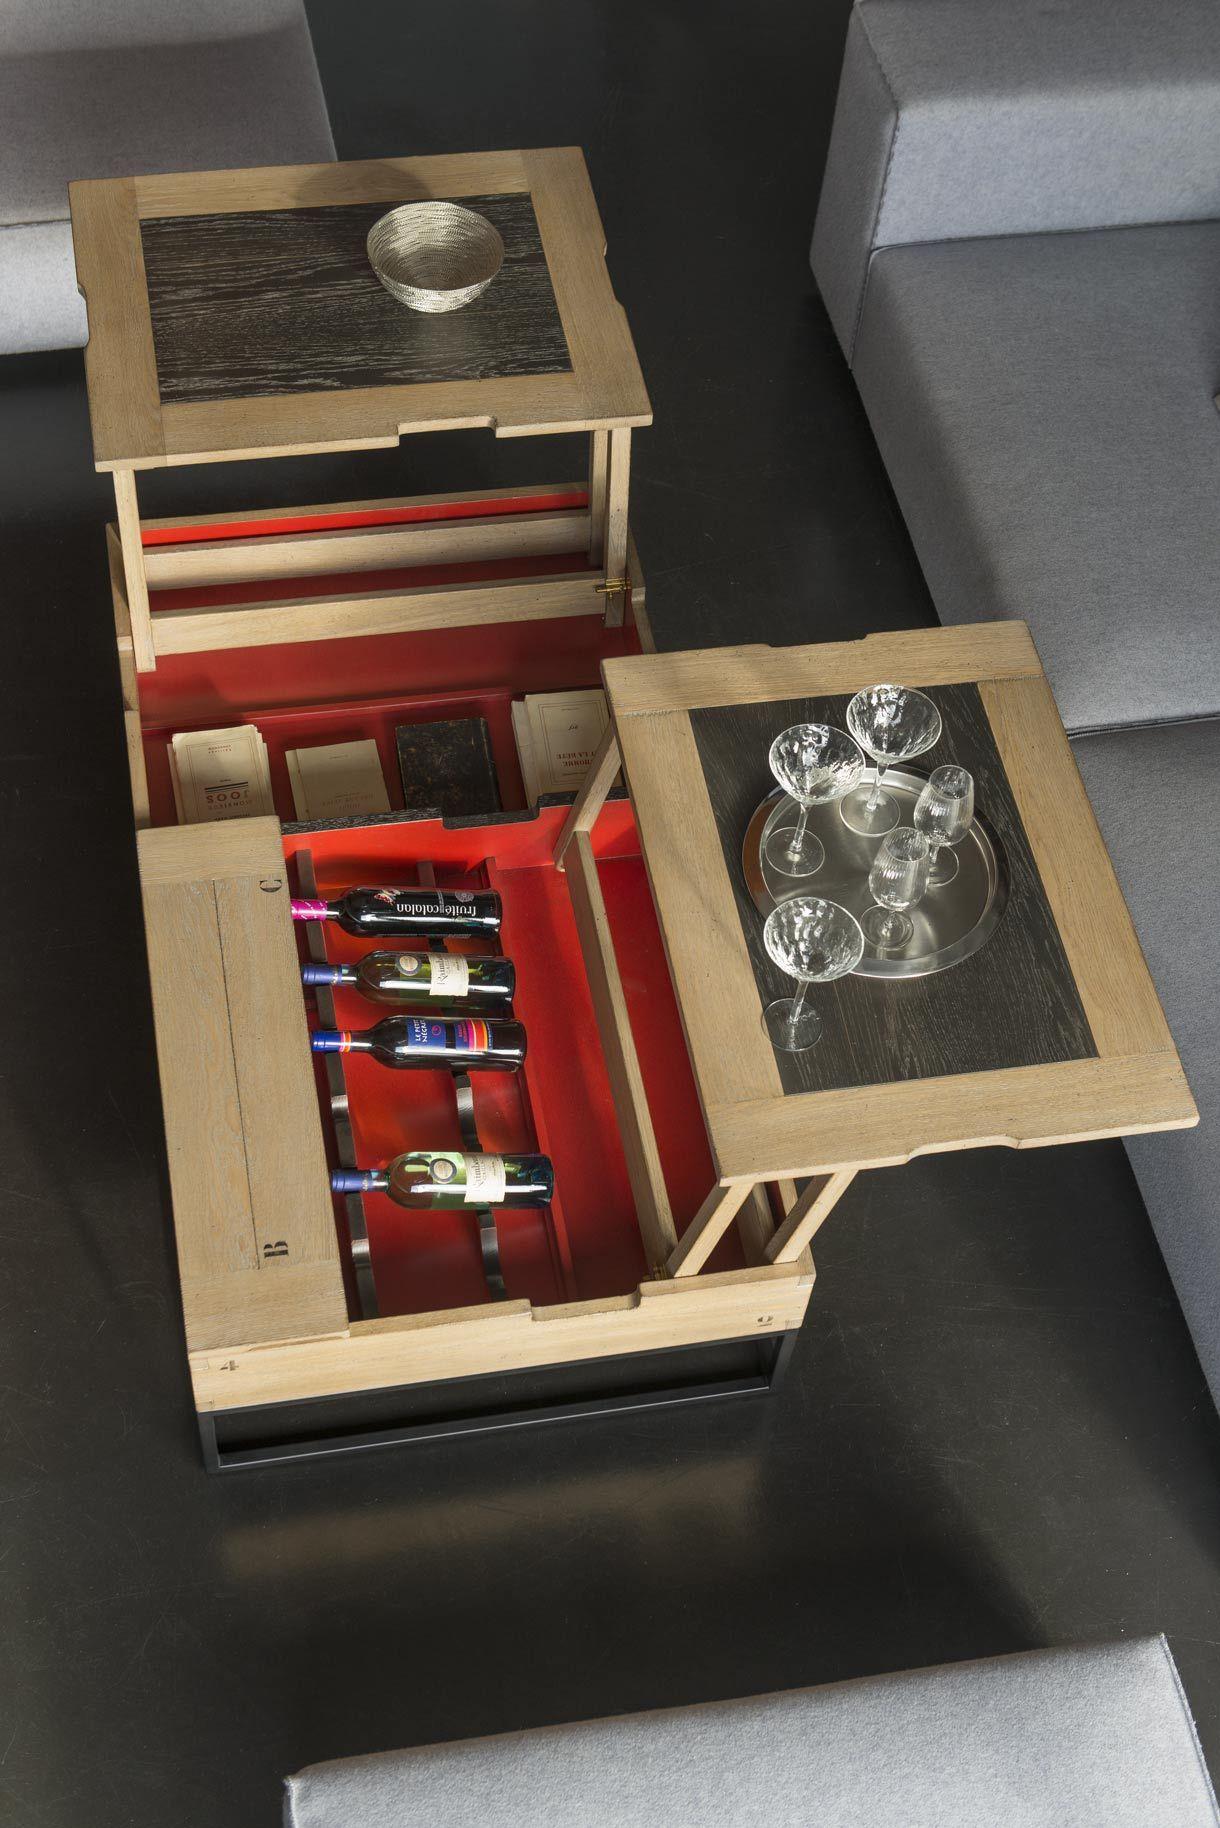 Artcopi Charme Des Temps Mobilier Complements Tables Basses Rangement Gueridons Meubles Valnet Ober Table Basse Relevable Table Basse Transformable Table Basse